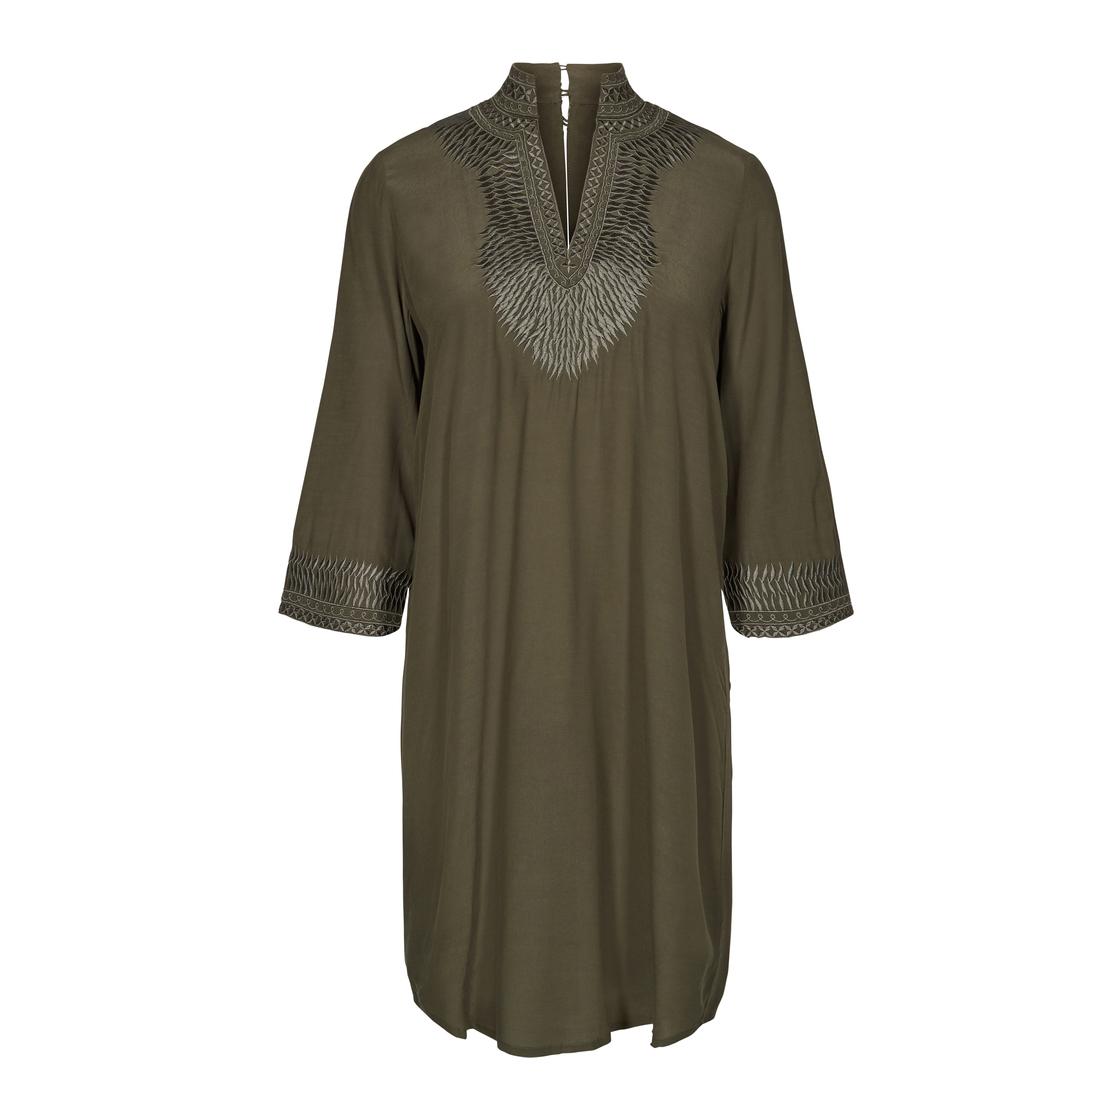 Mosmosh 128220 507 Tess Dress Grape Leaf Grün